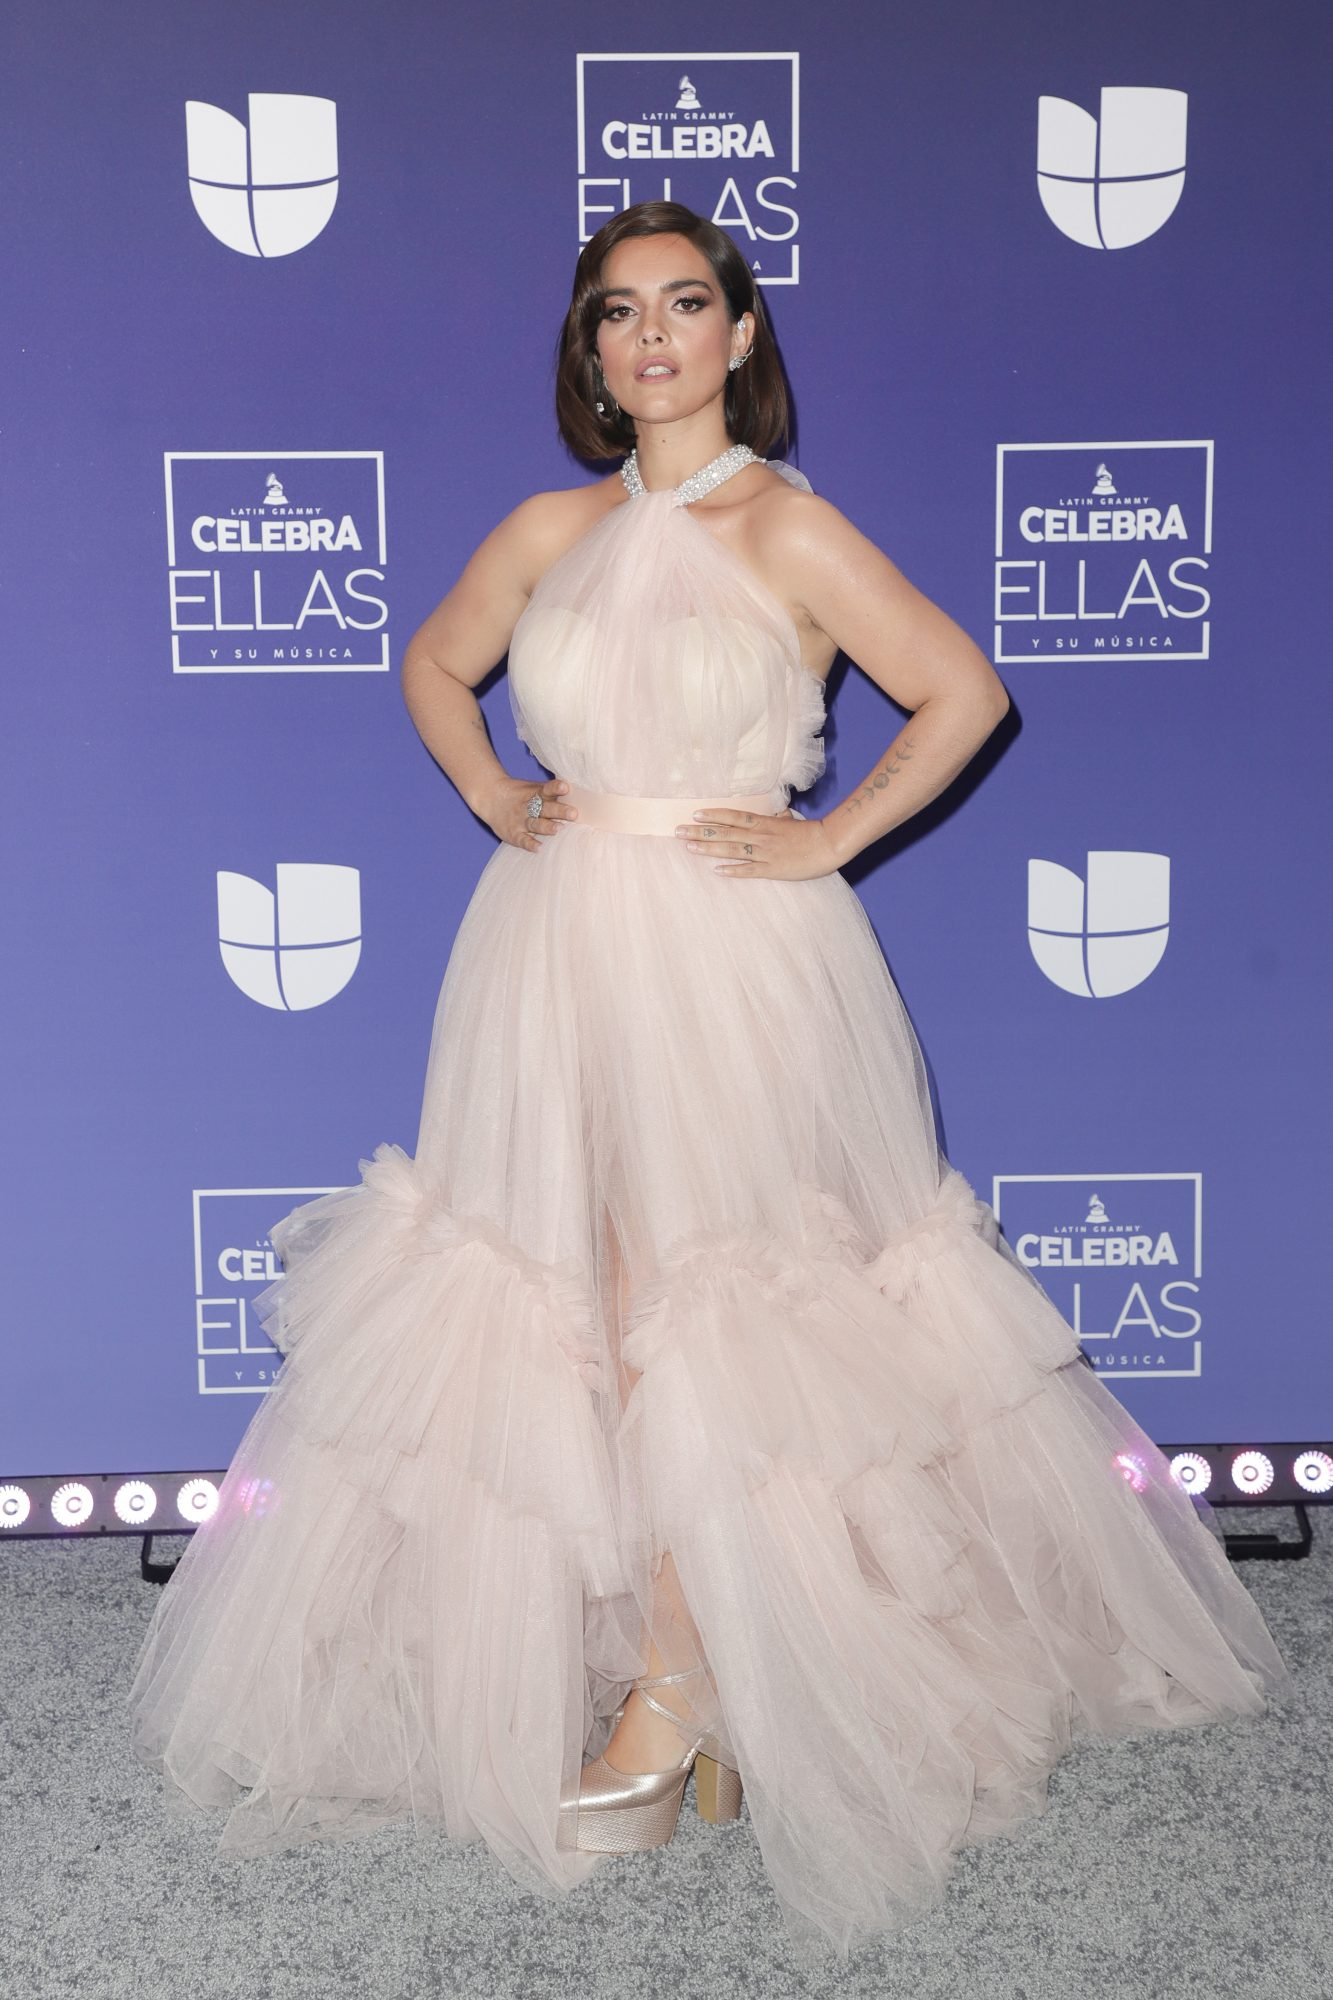 Paula Arenas, Latin Grammy